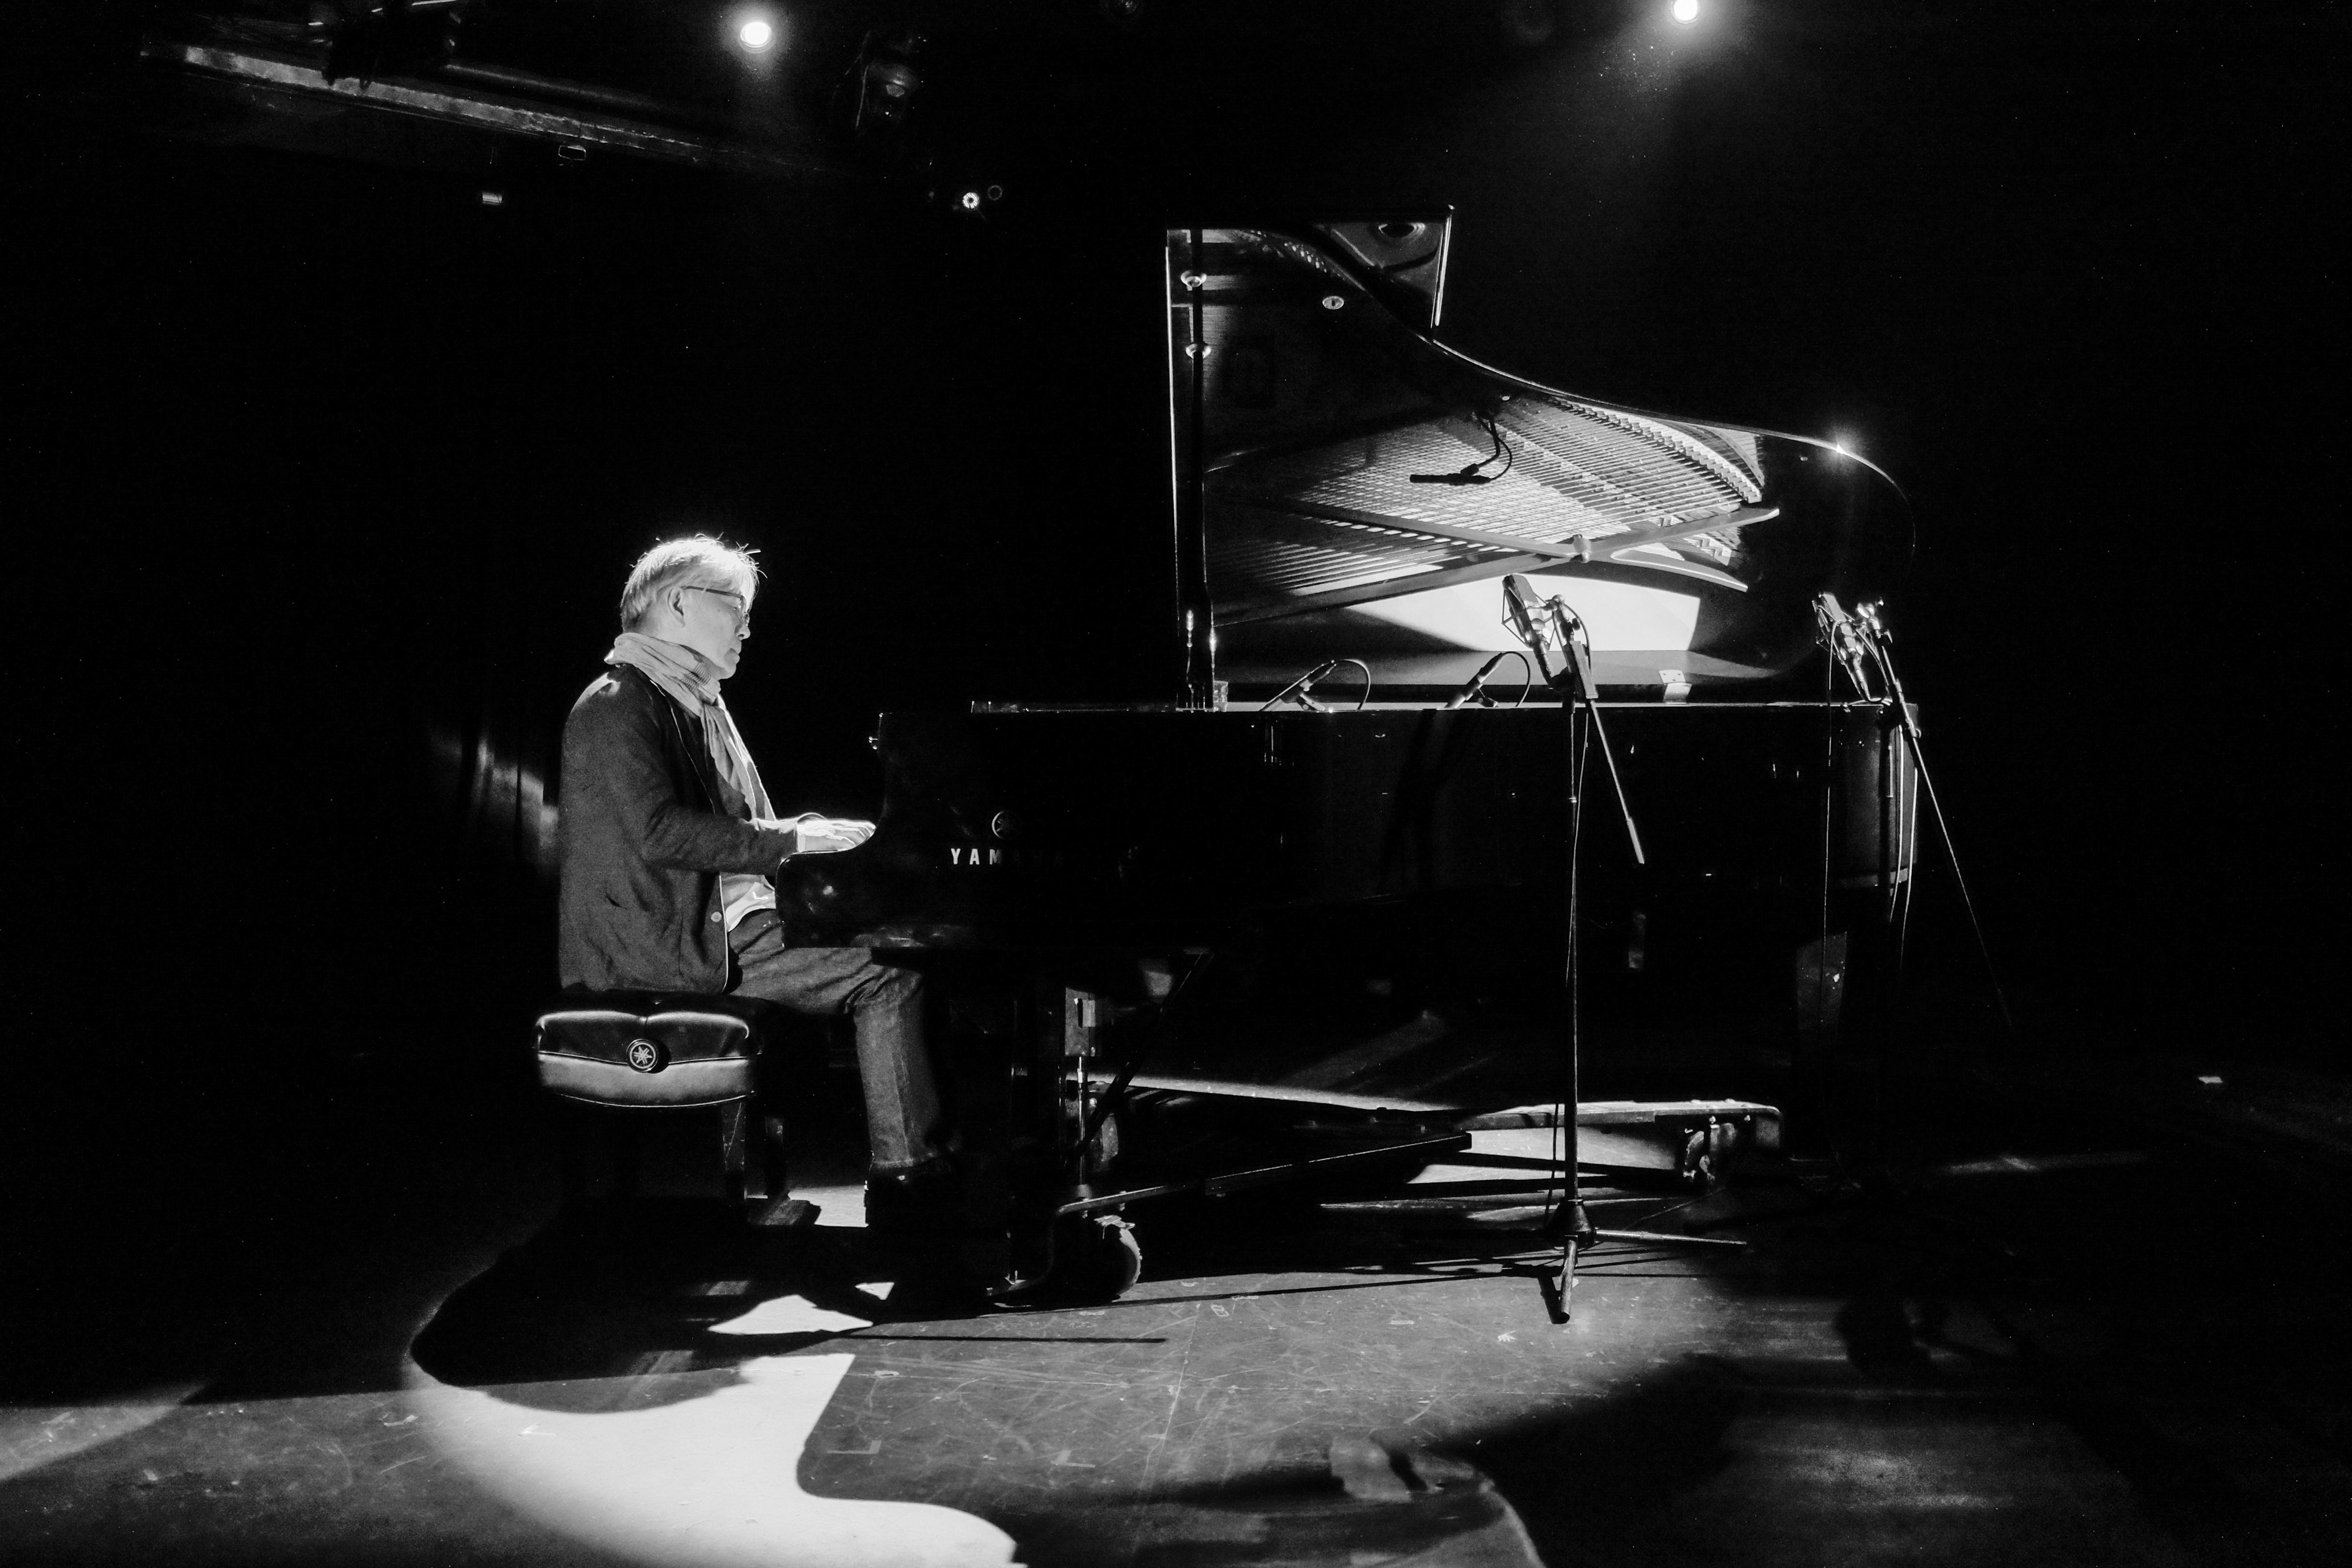 NEW YORK, NY - MAY 10: Japanese composer Ryuichi Sakamoto plays music he wrote for Linda Hoaglund's new documentary film 'The